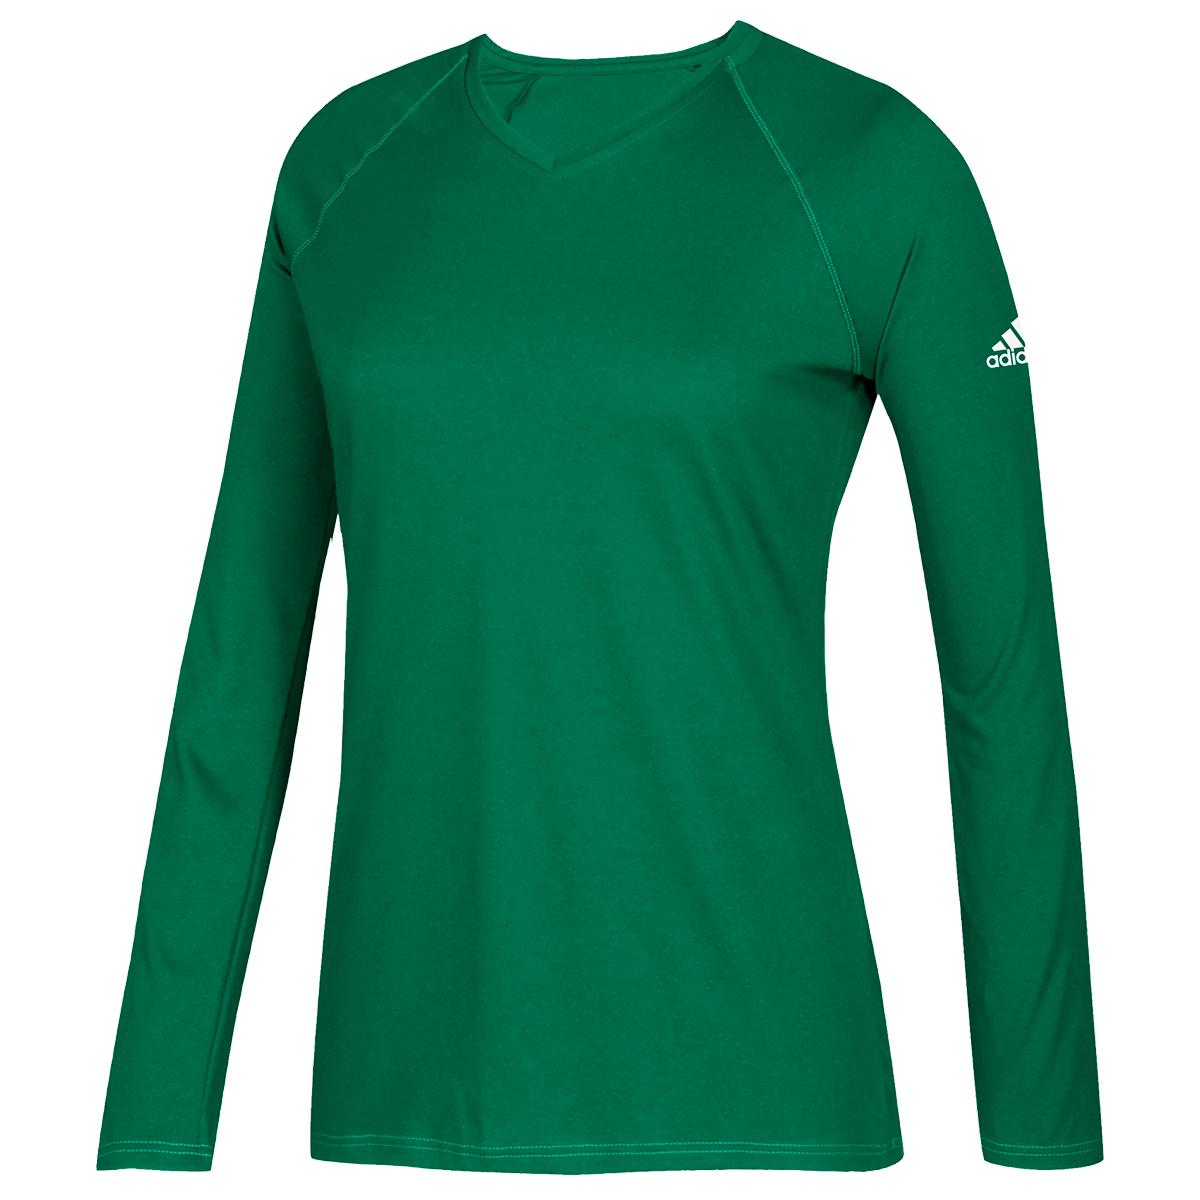 Adidas Women's Long-Sleeve Climate Tee - Green, M